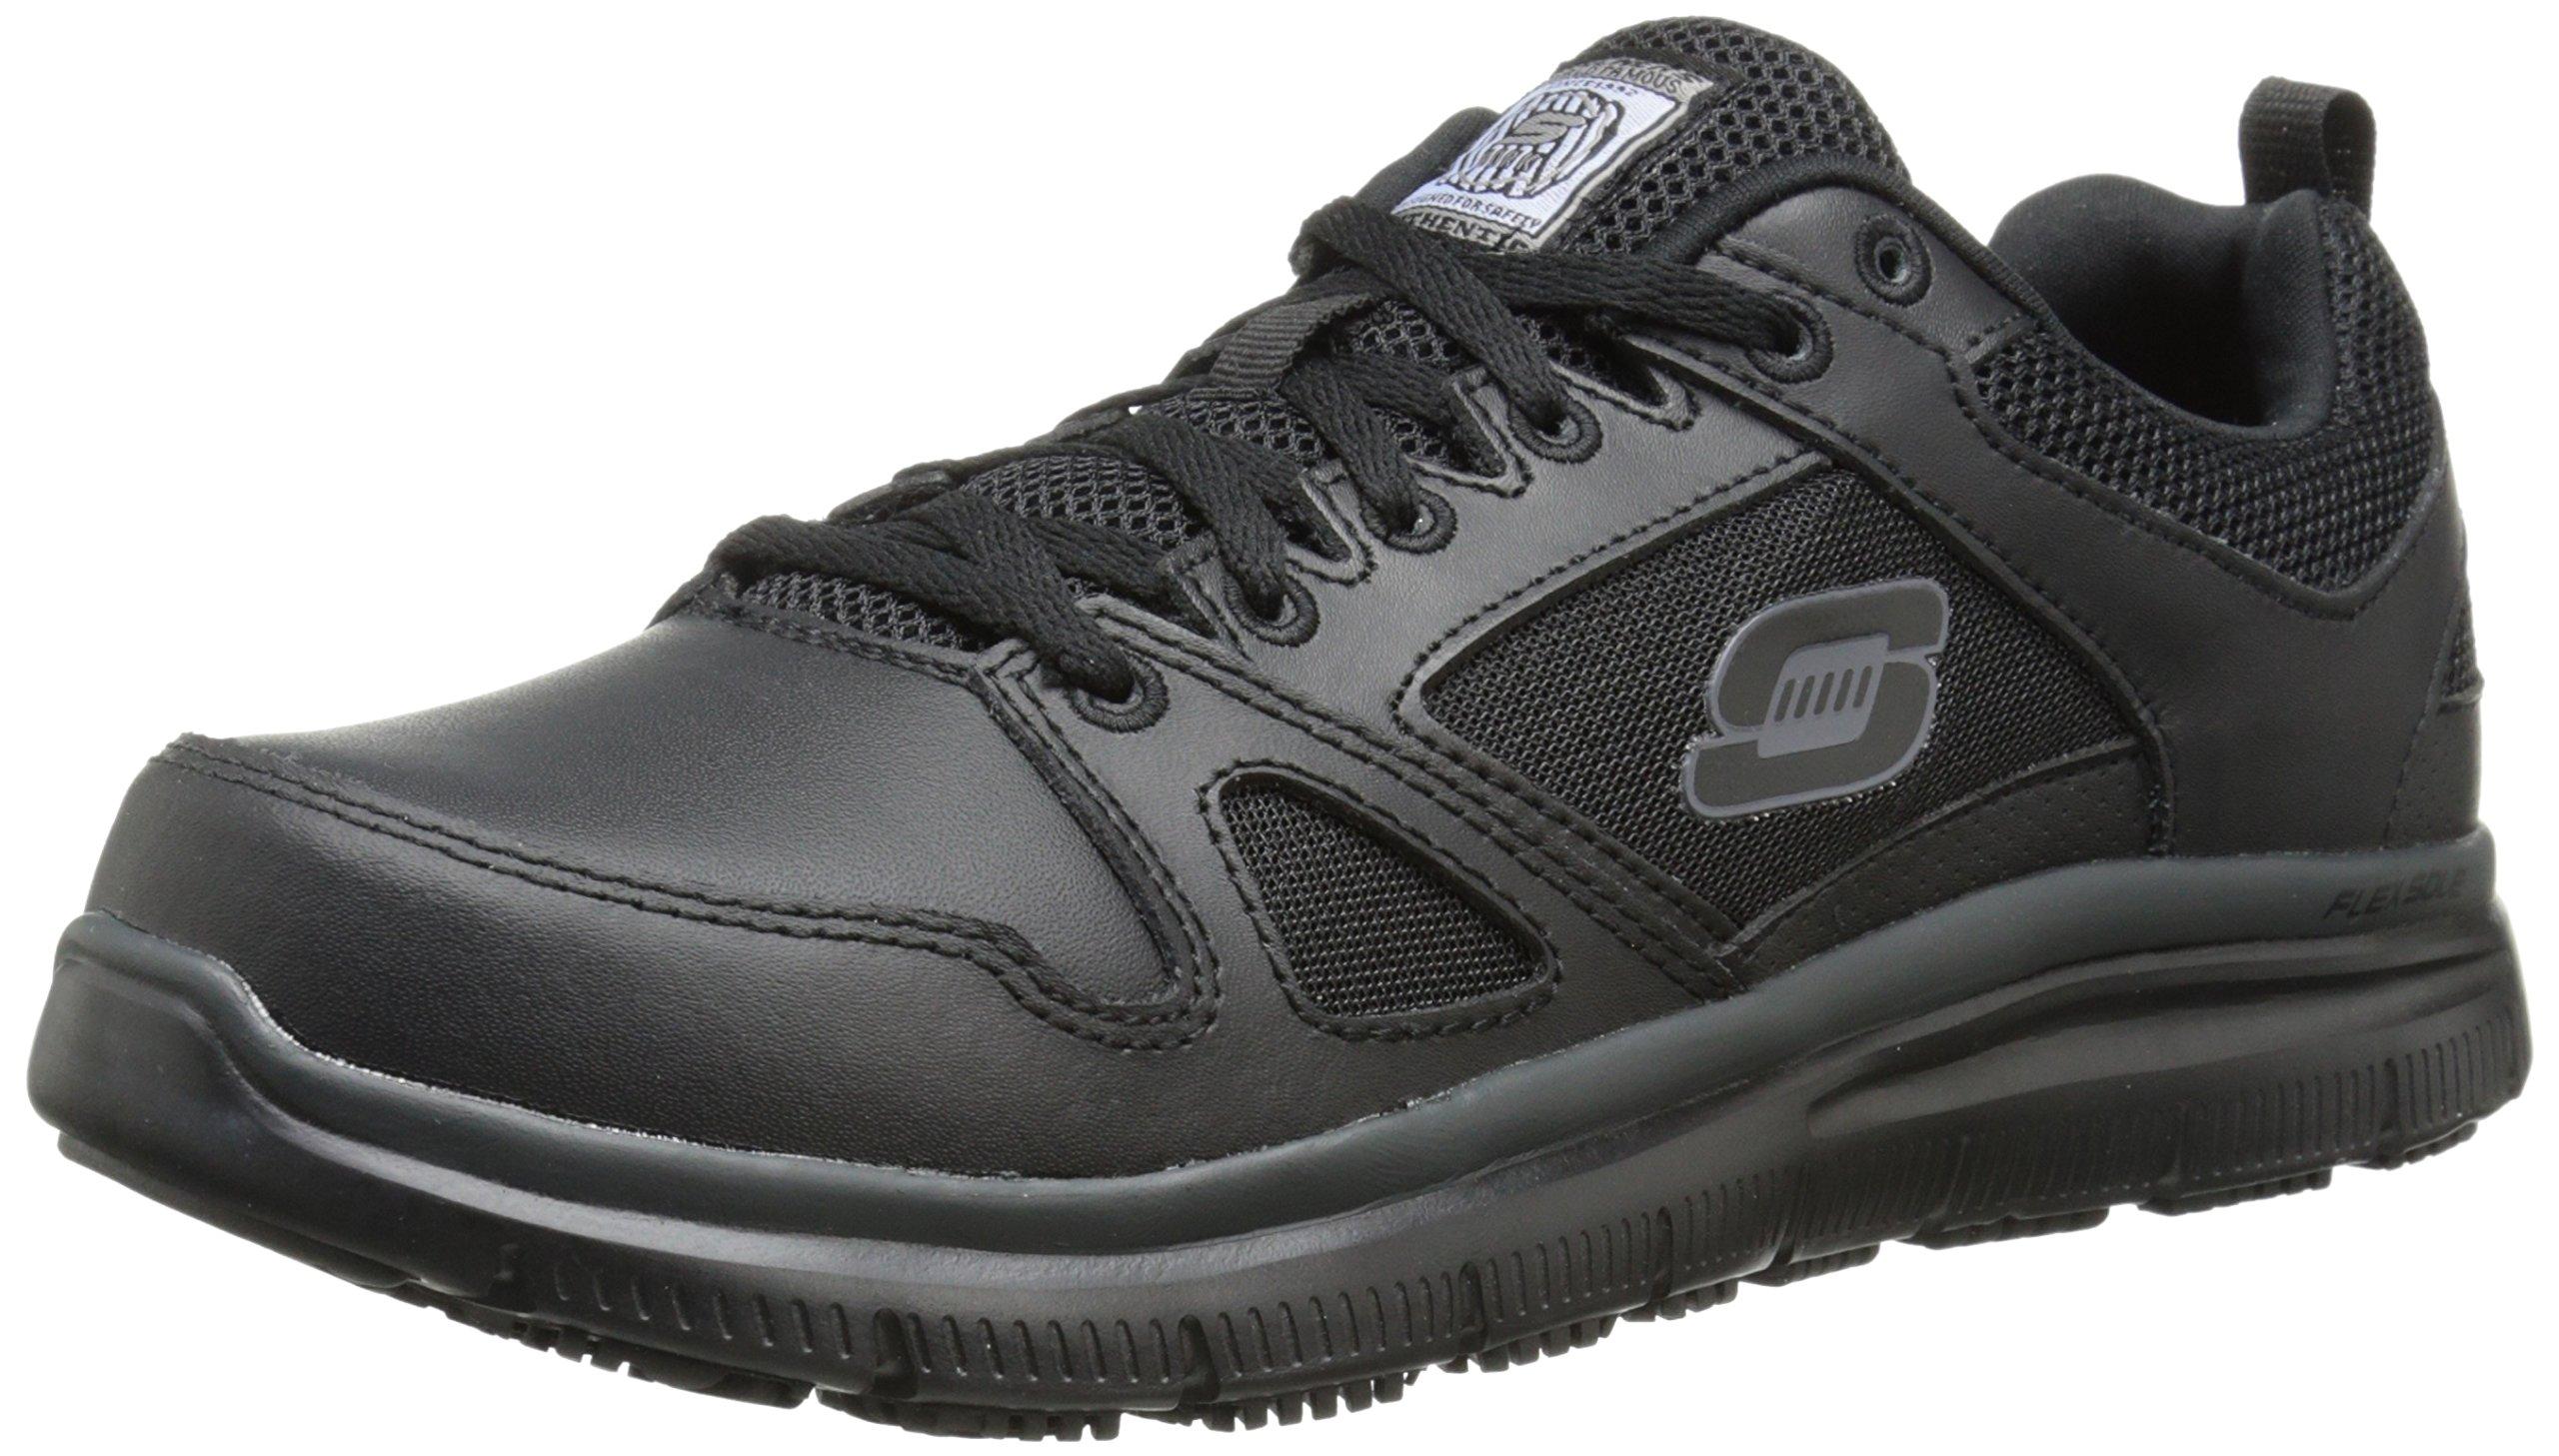 Skechers for Work Men's Flex Advantage Slip Resistant Oxford Sneaker, Black, 11 W US